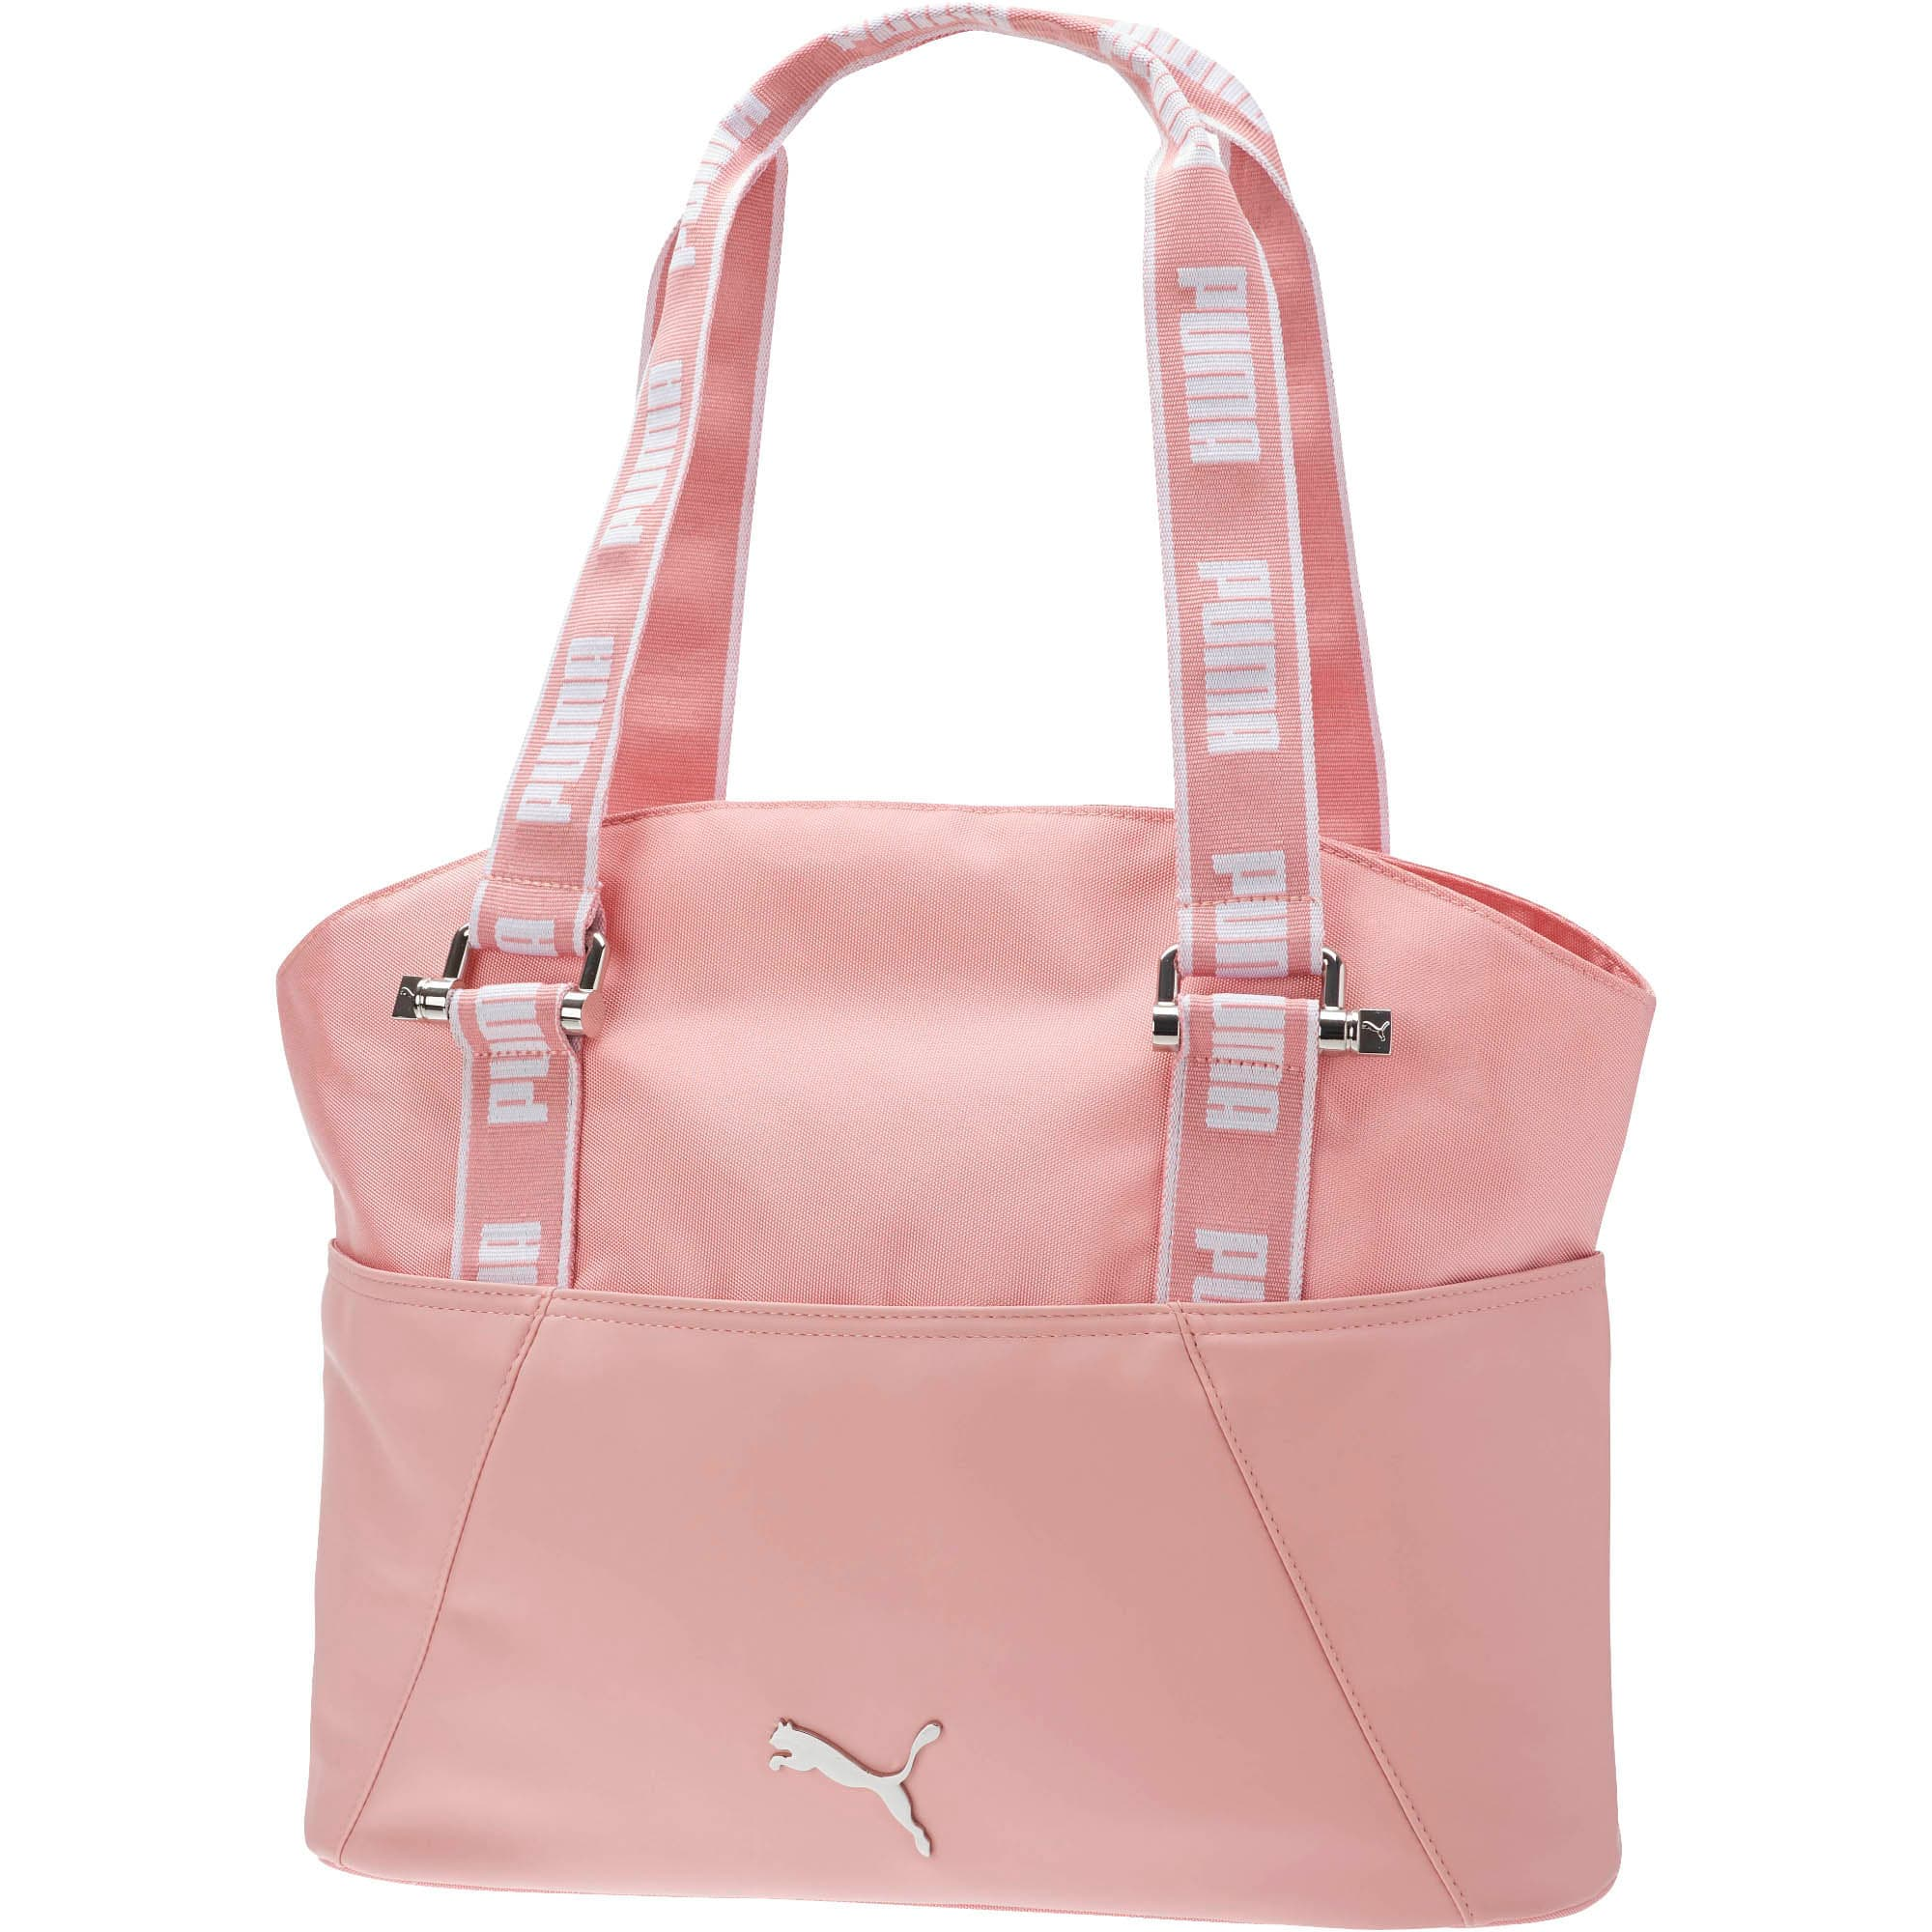 Thumbnail 1 of Marnie Tote Bag, Medium Pink, medium